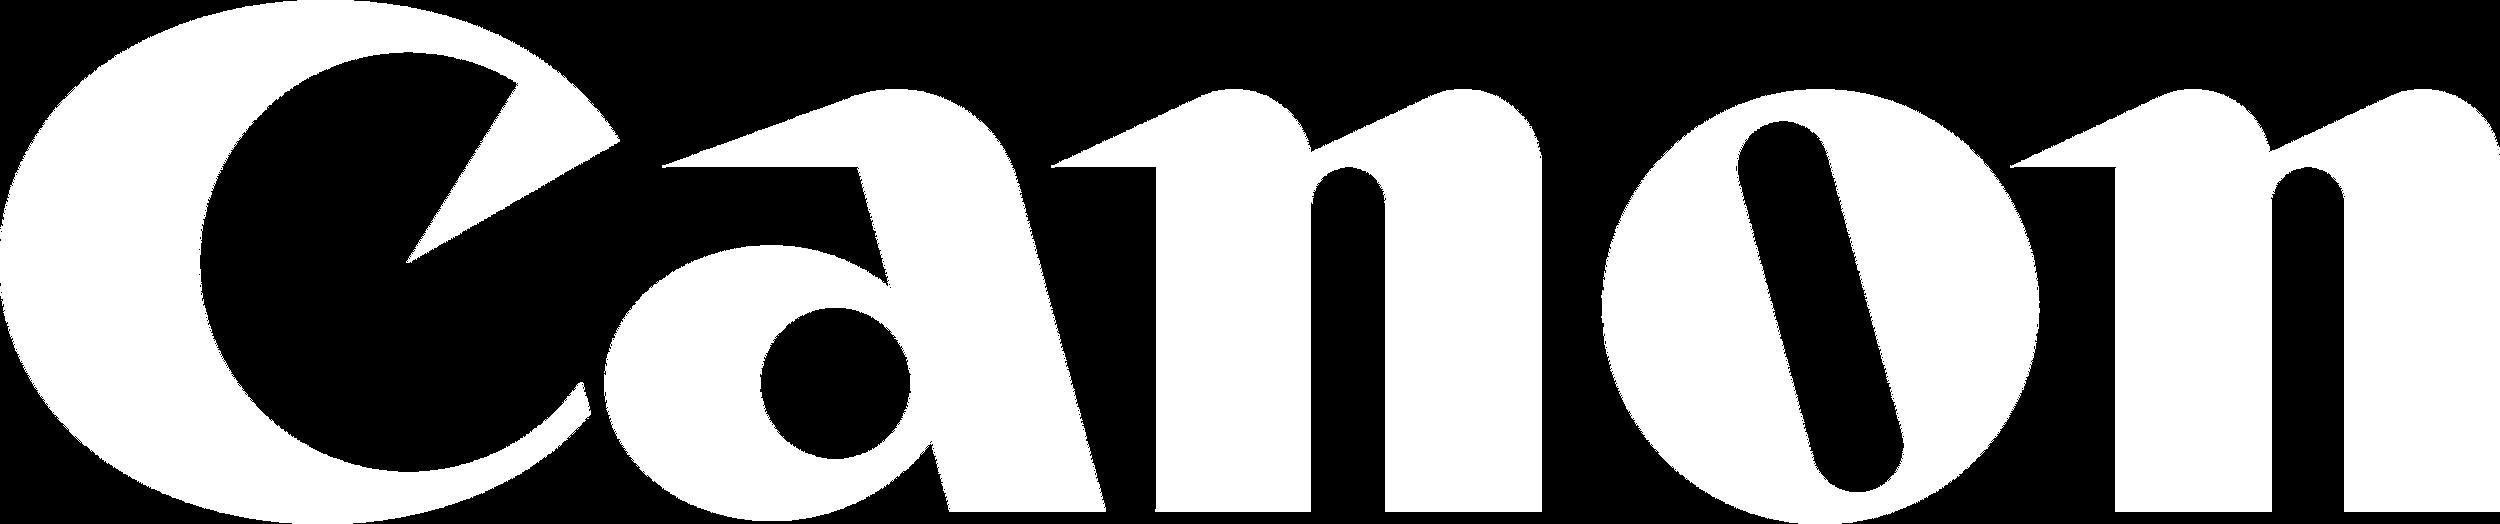 canon-invert-logo.png